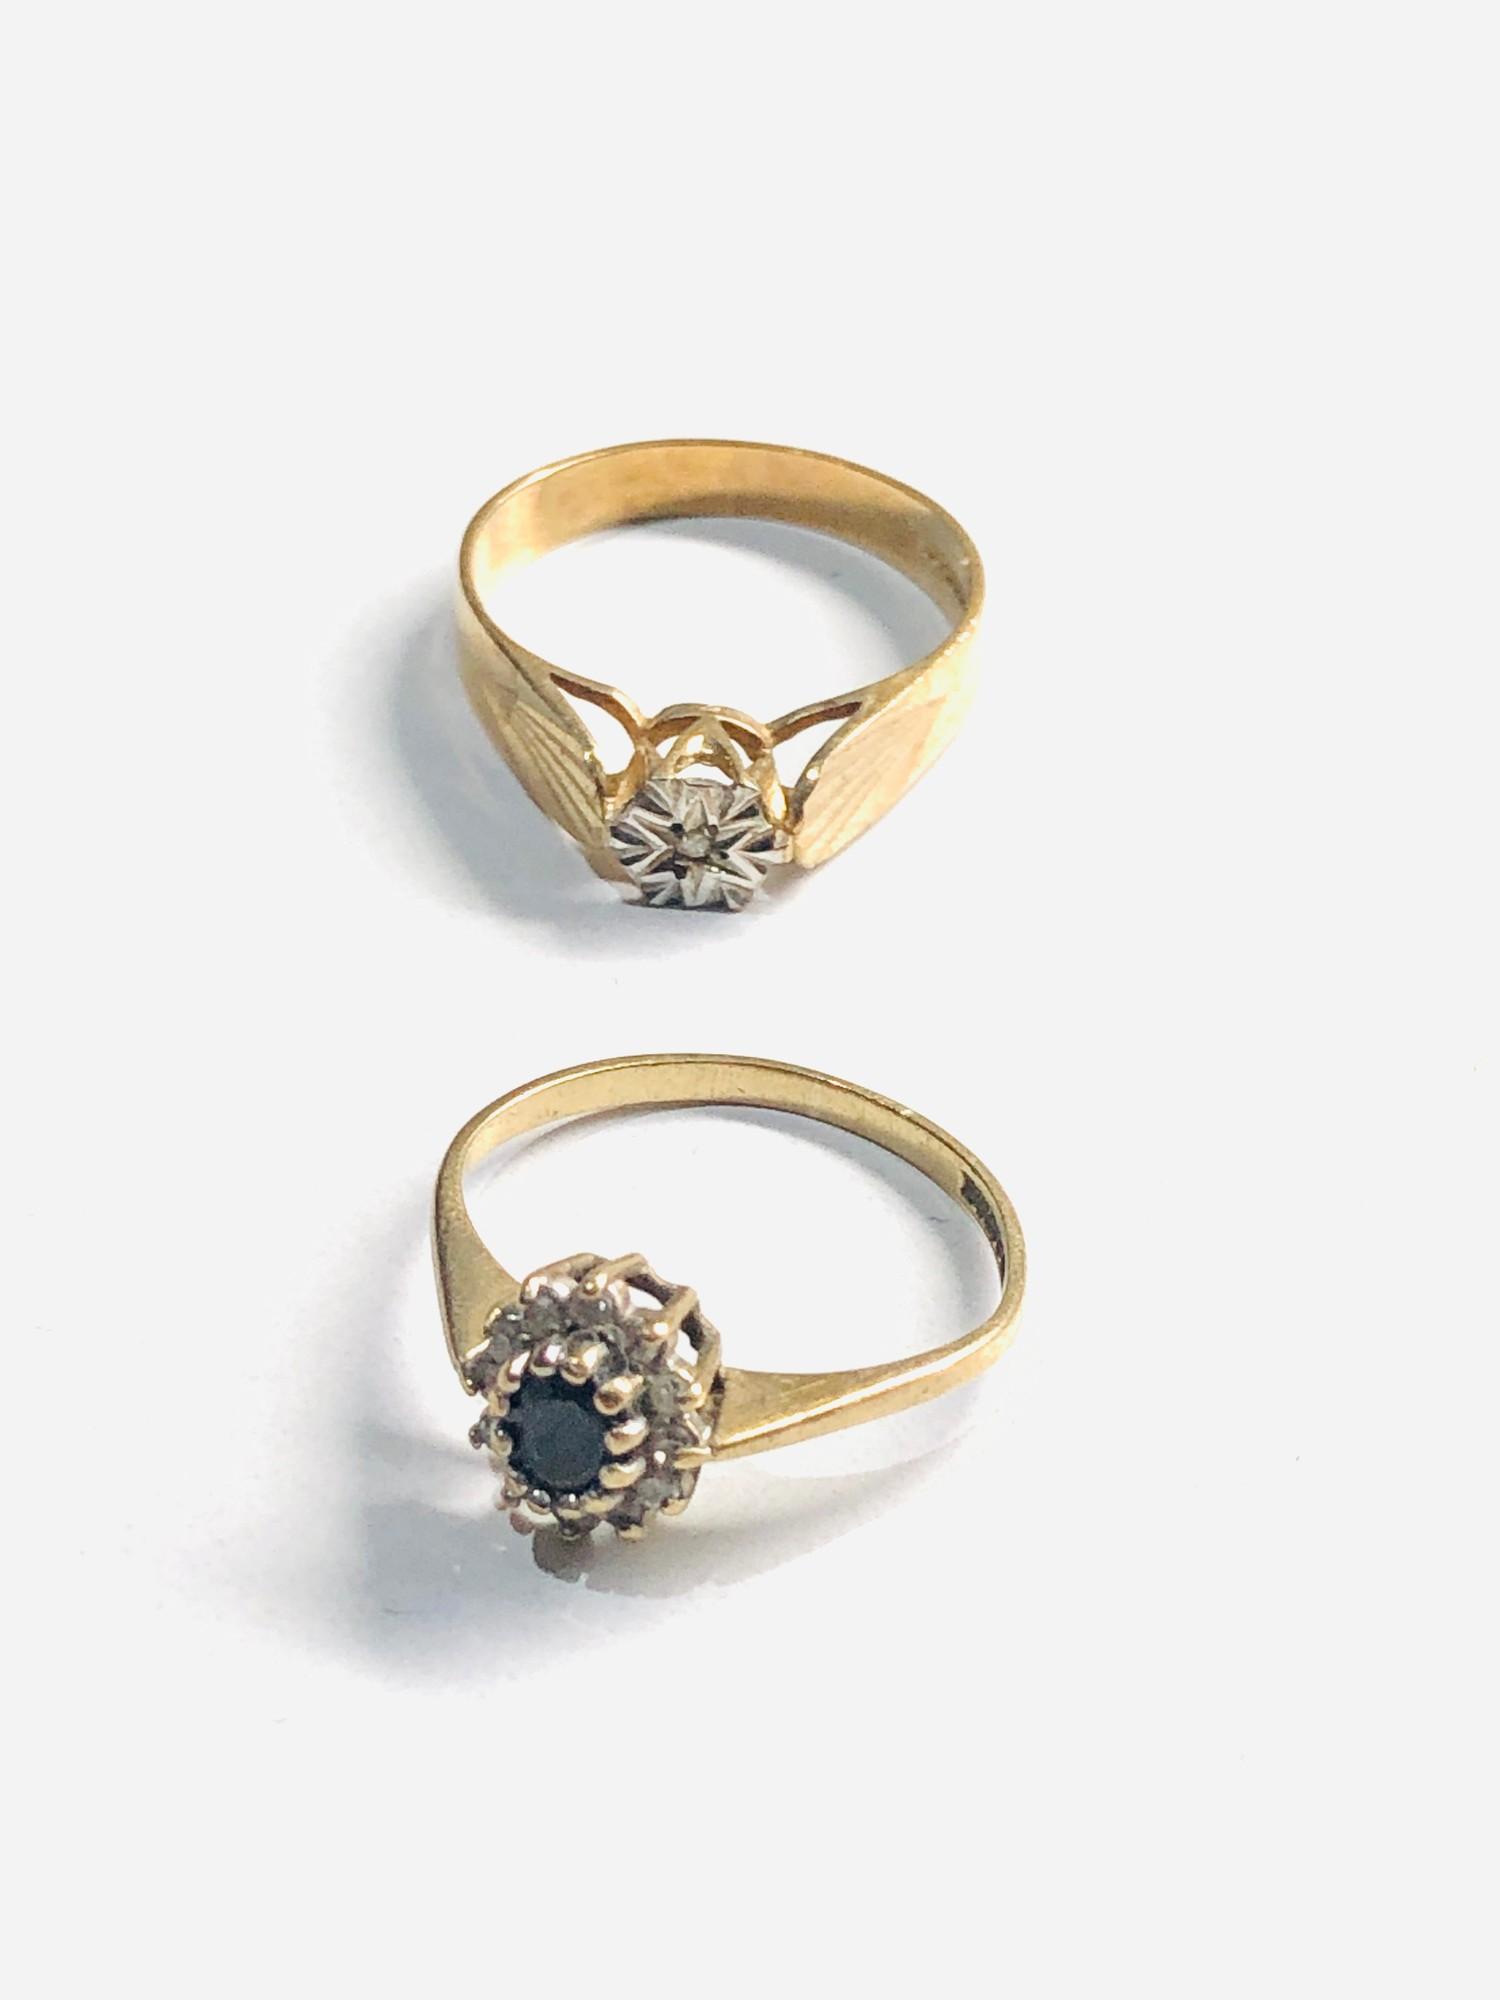 2 x 9ct Gold diamond detail rings 3.2g